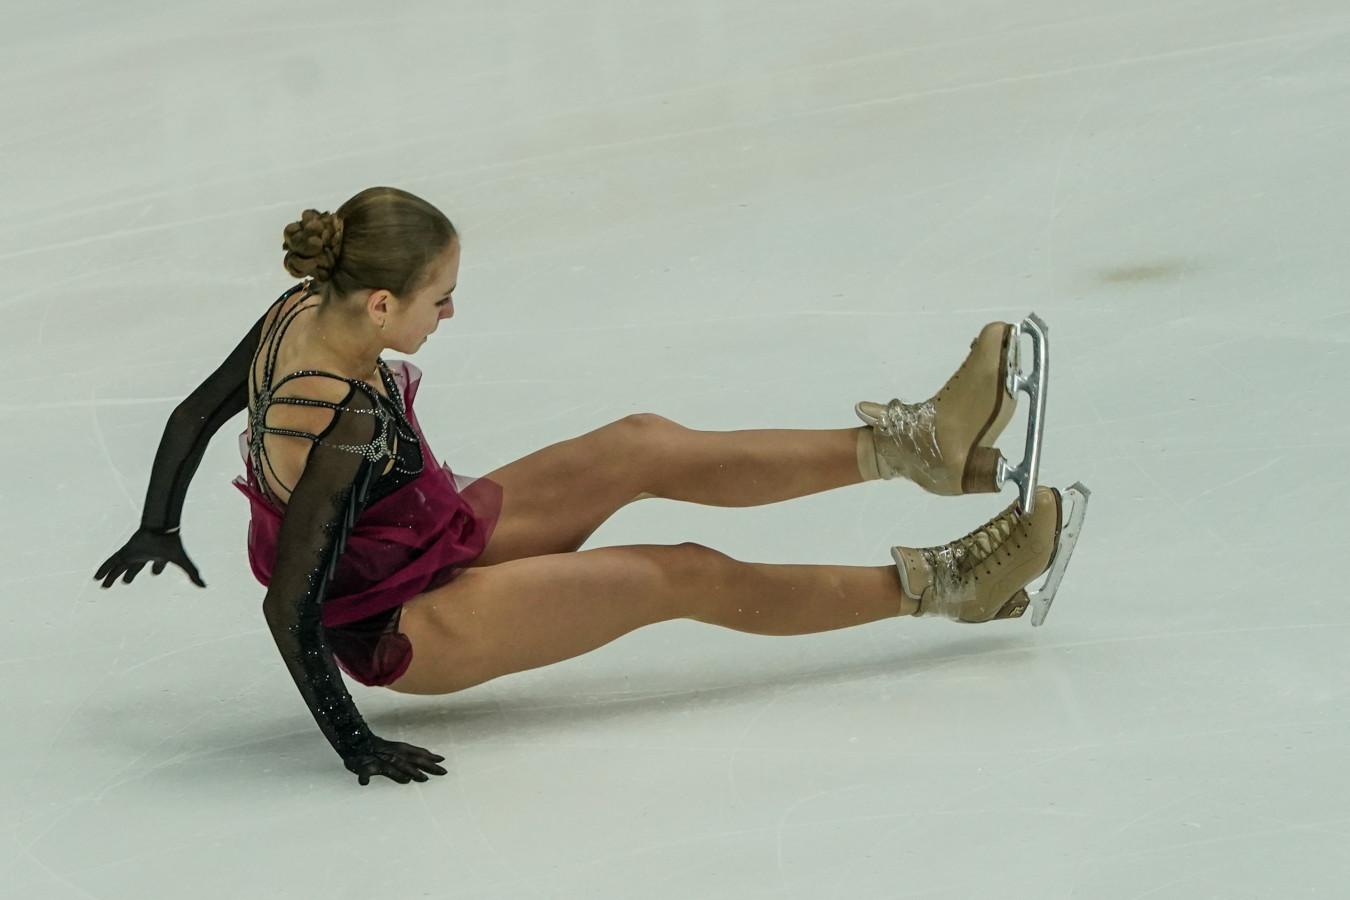 Александра Трусова сорвала каскад в короткой программе на чемпионате мира